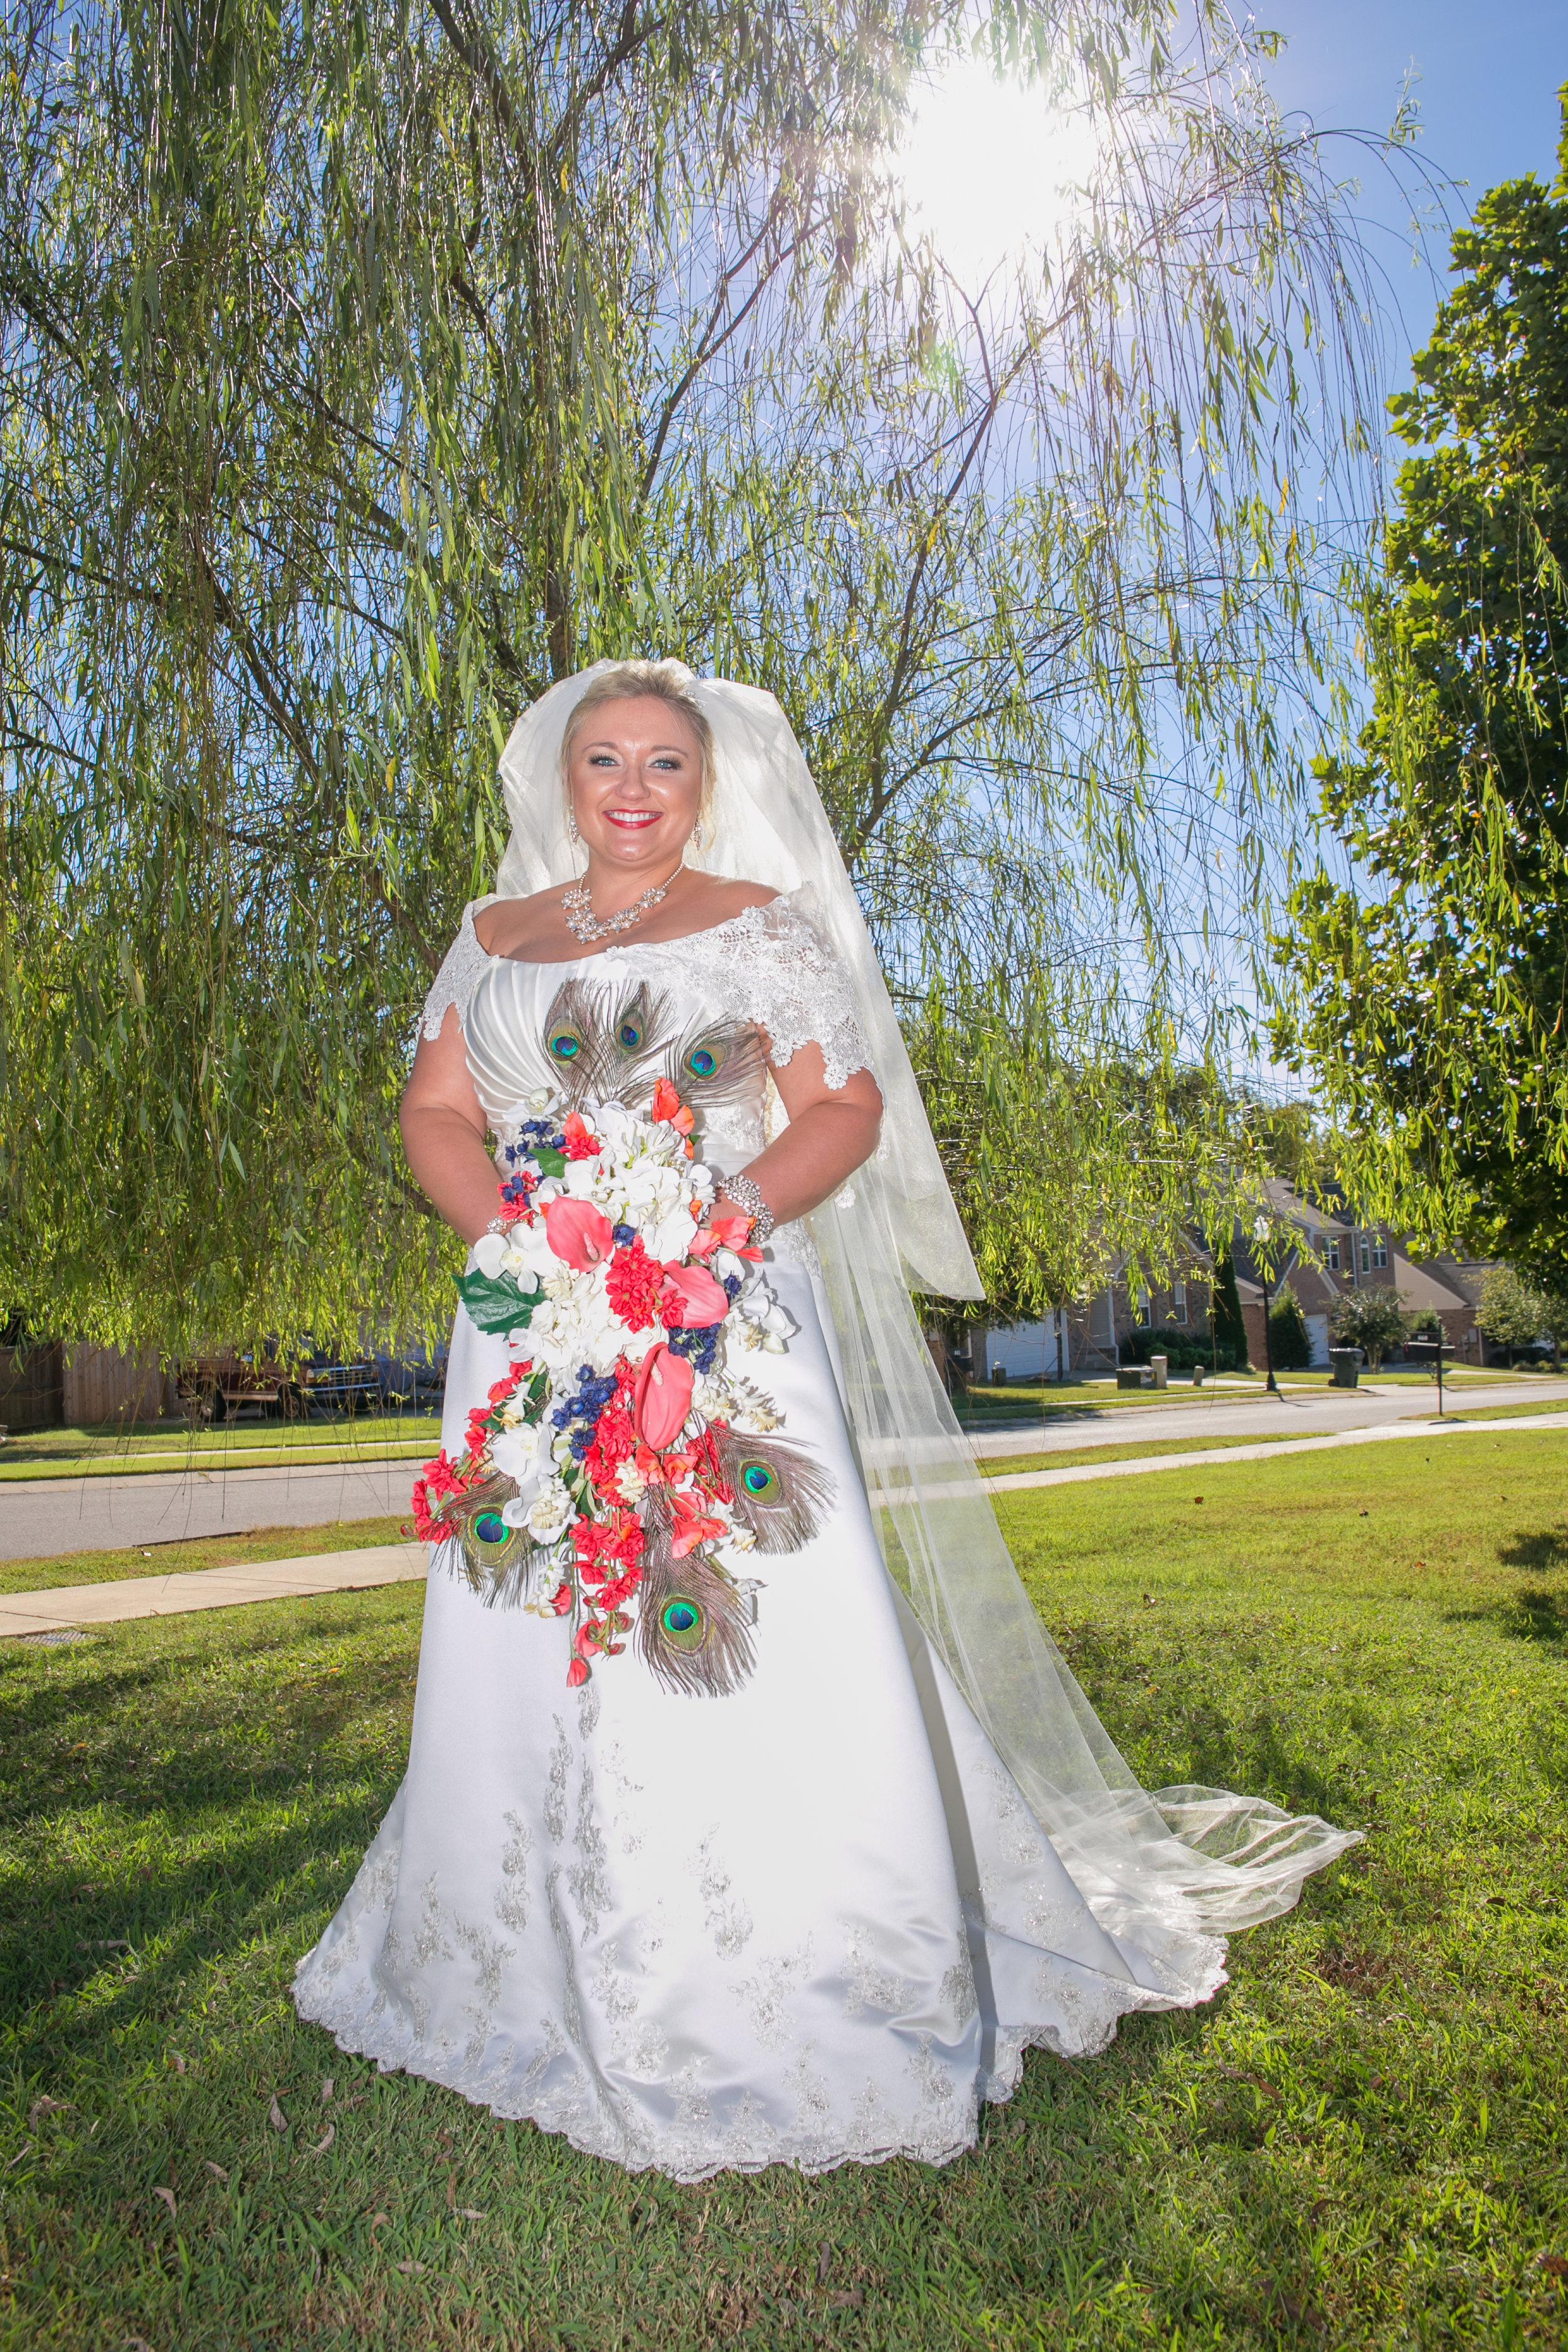 Nashville_Wedding_Photographers_DJ_Lighting_Bowling_Franklin (38 of 51).jpg